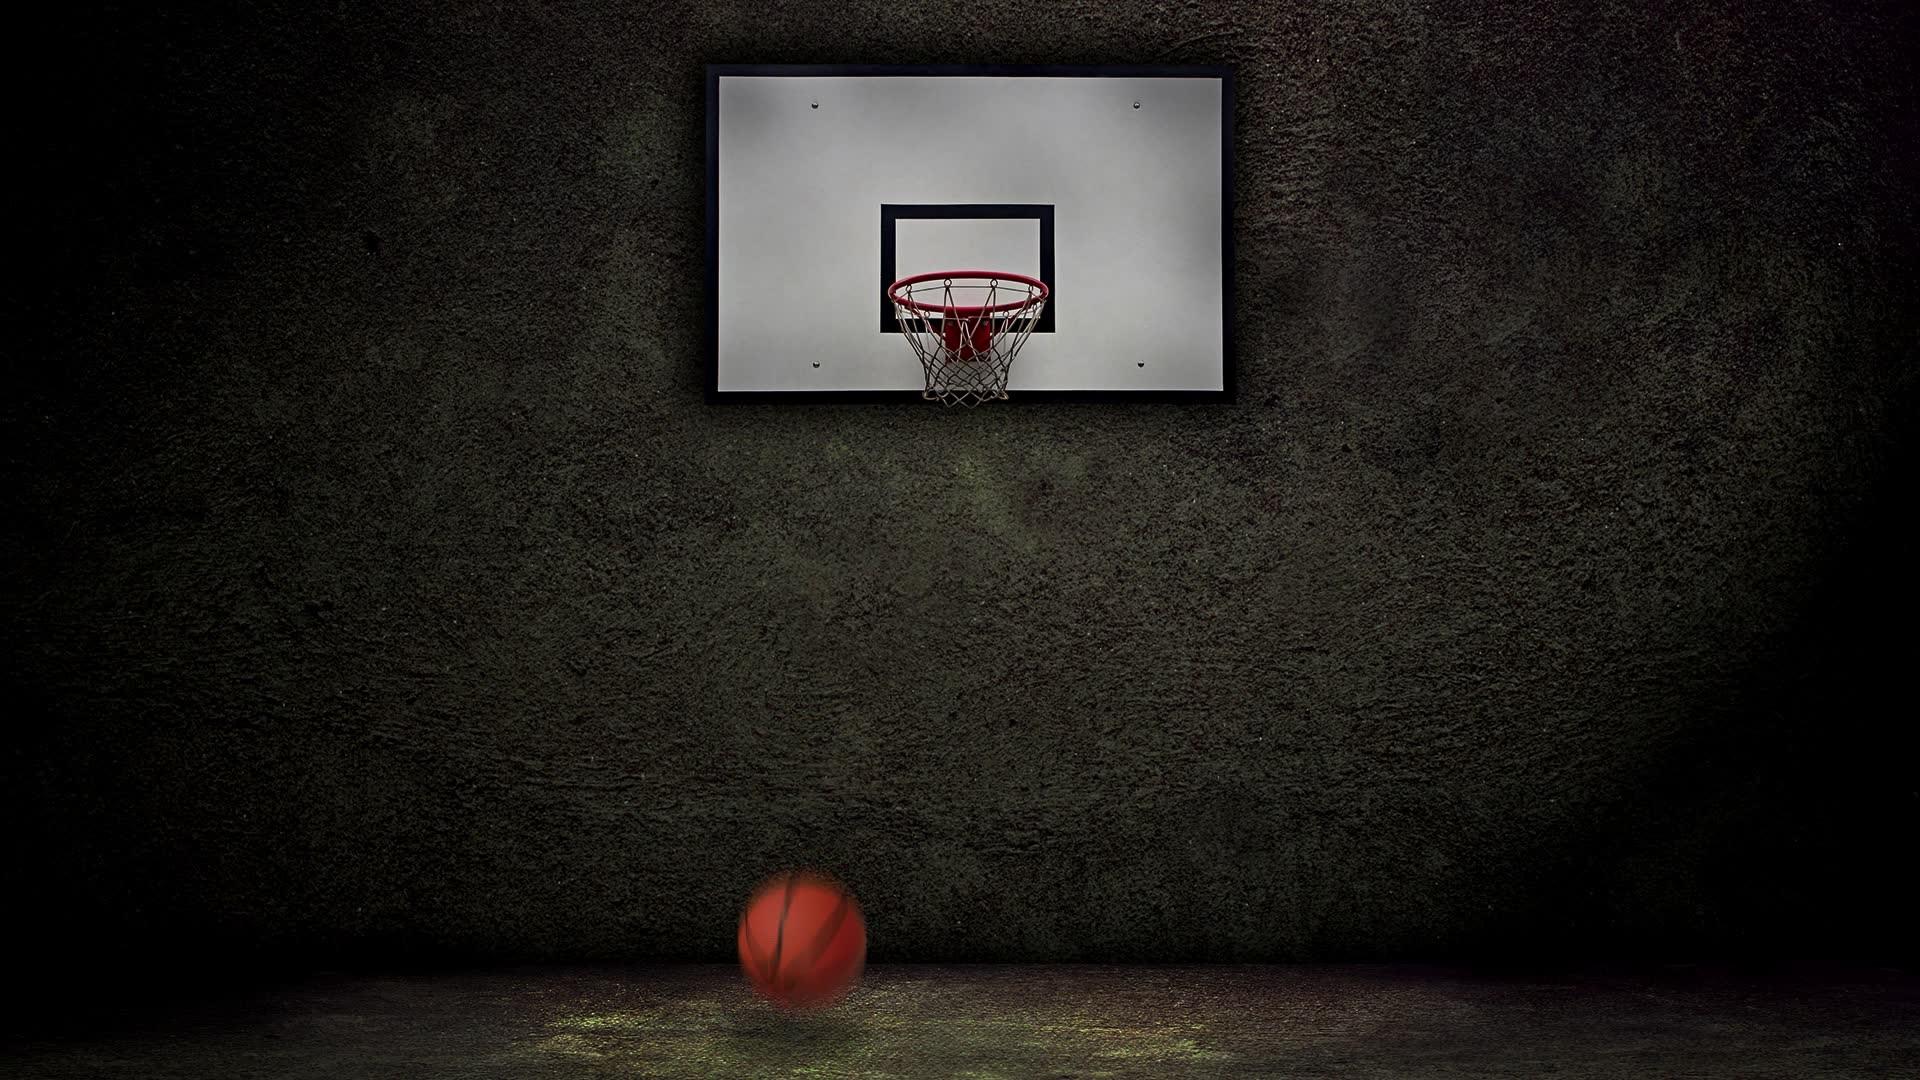 3d basketball wallpapers for desktop - photo #45